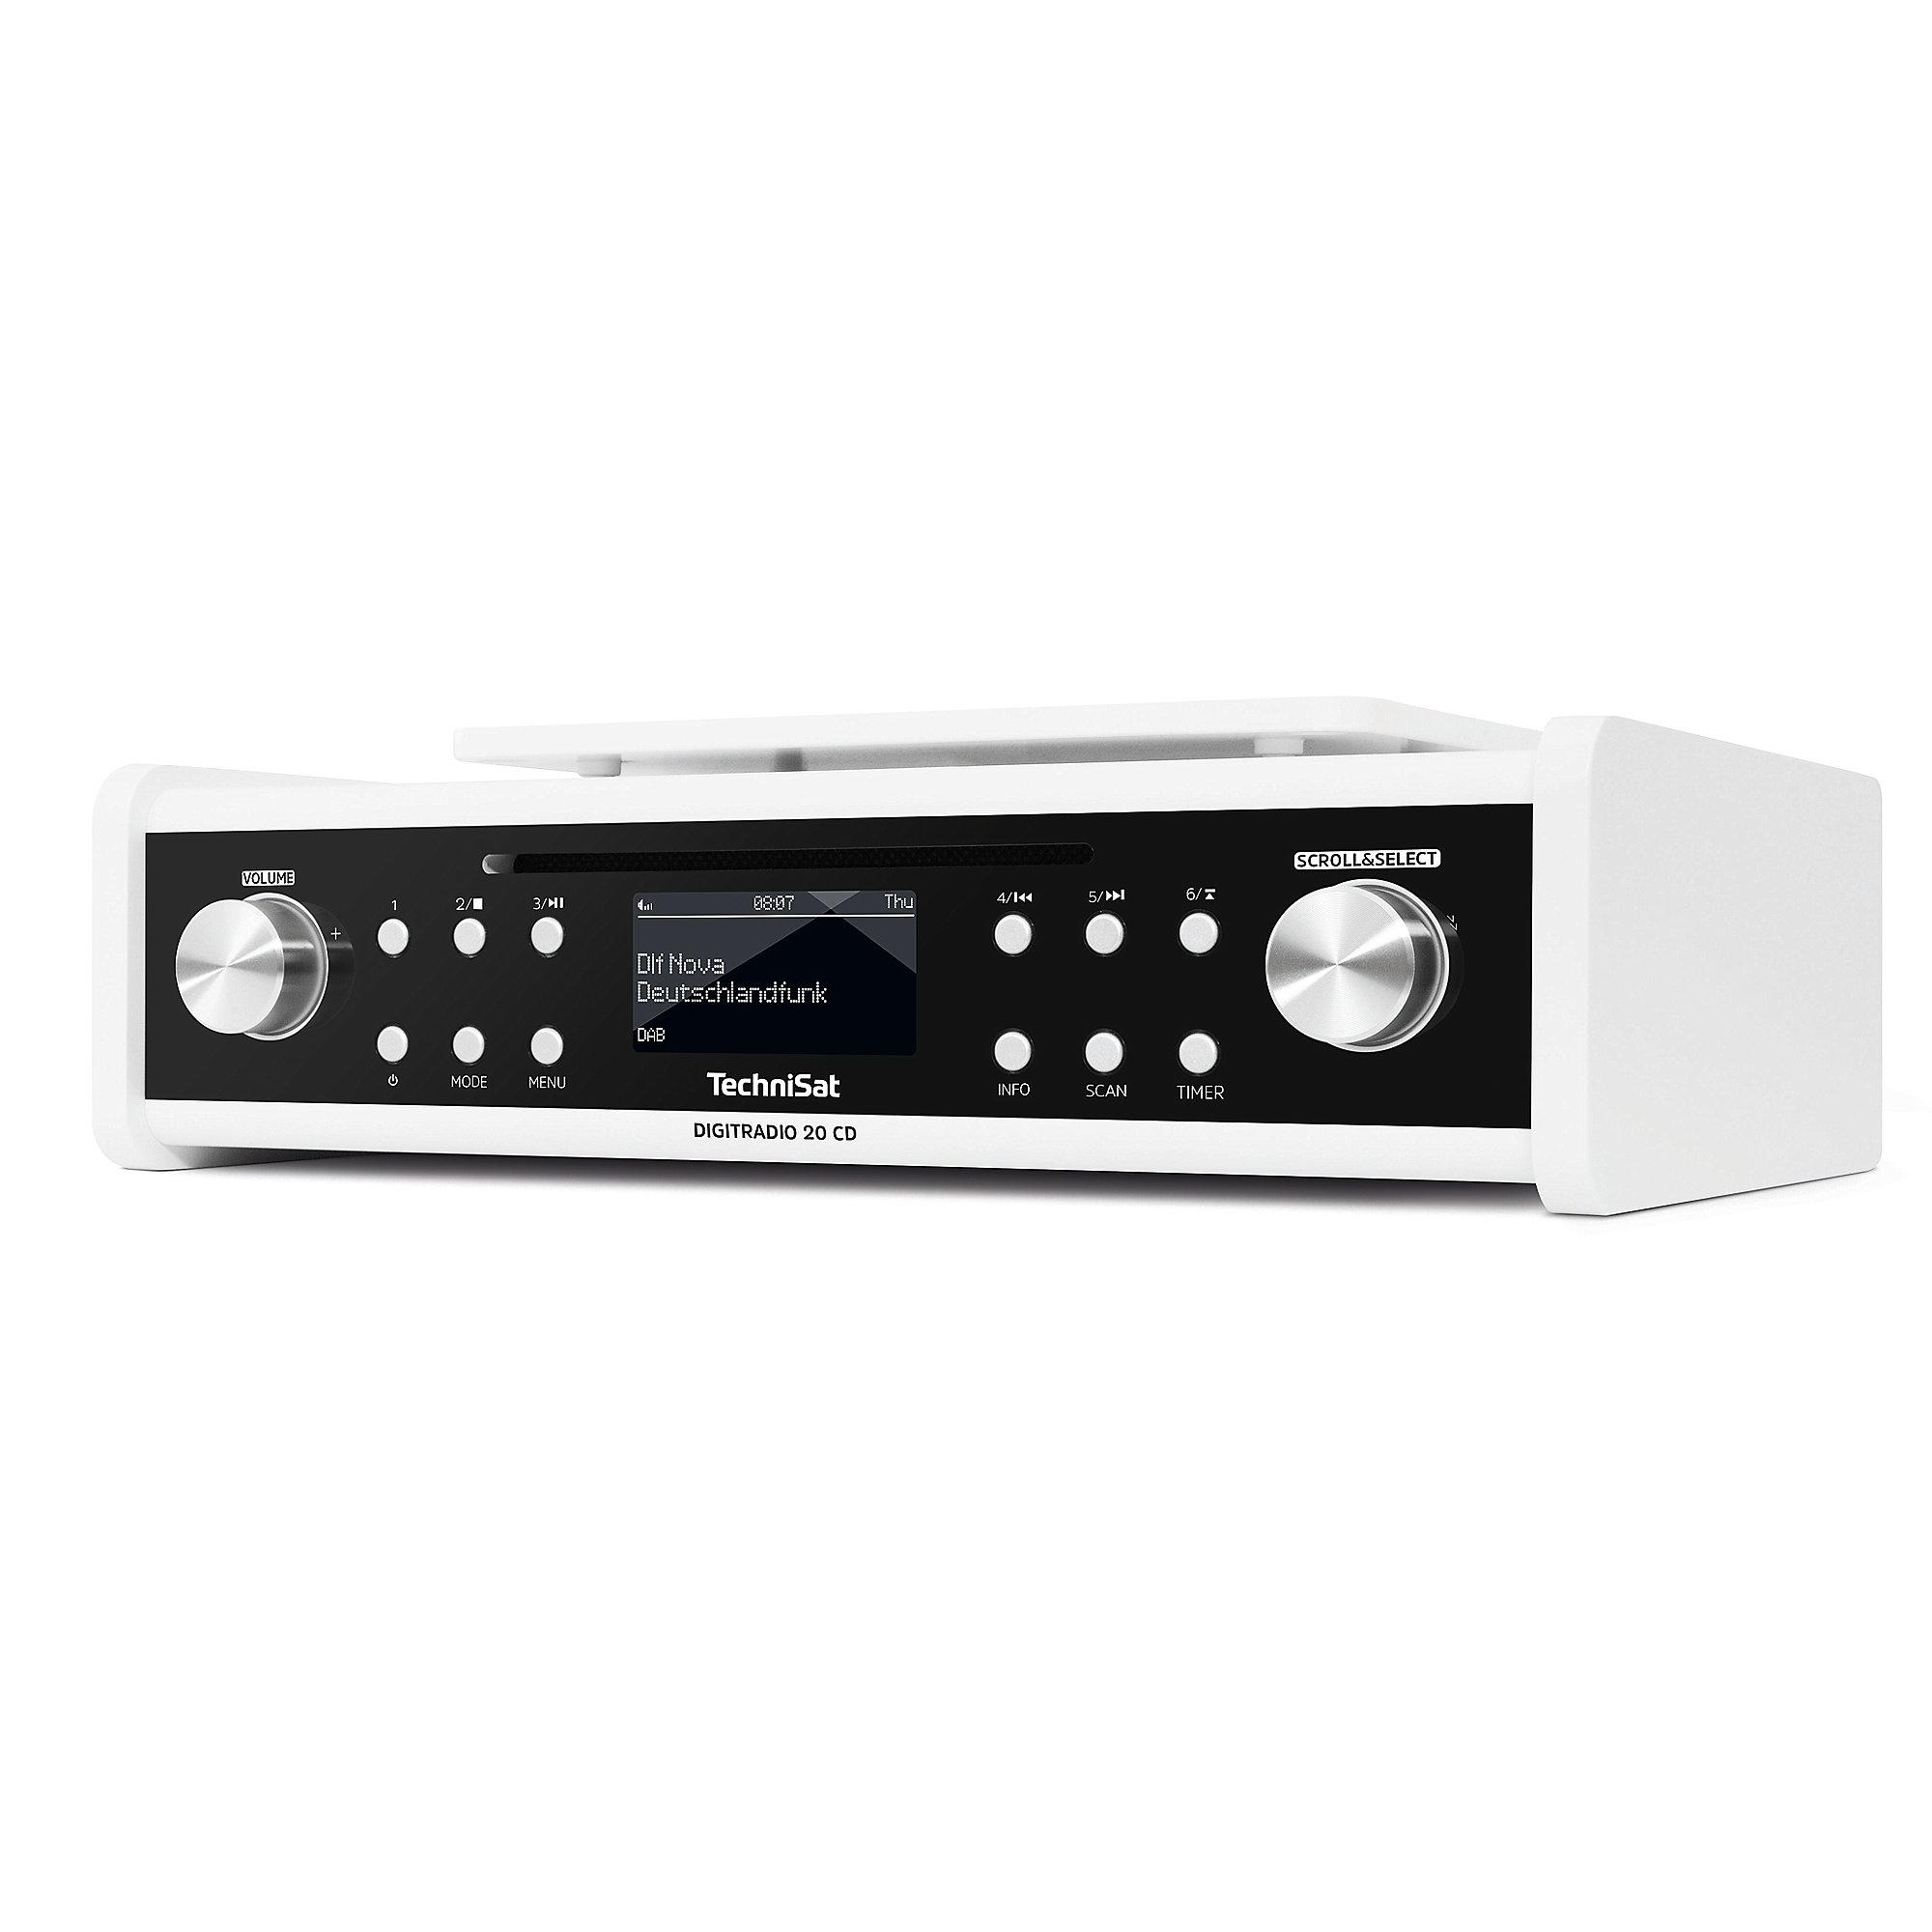 technisat digitradio 20 cd wei ukw dab unterbau radio mit cd cyberport. Black Bedroom Furniture Sets. Home Design Ideas